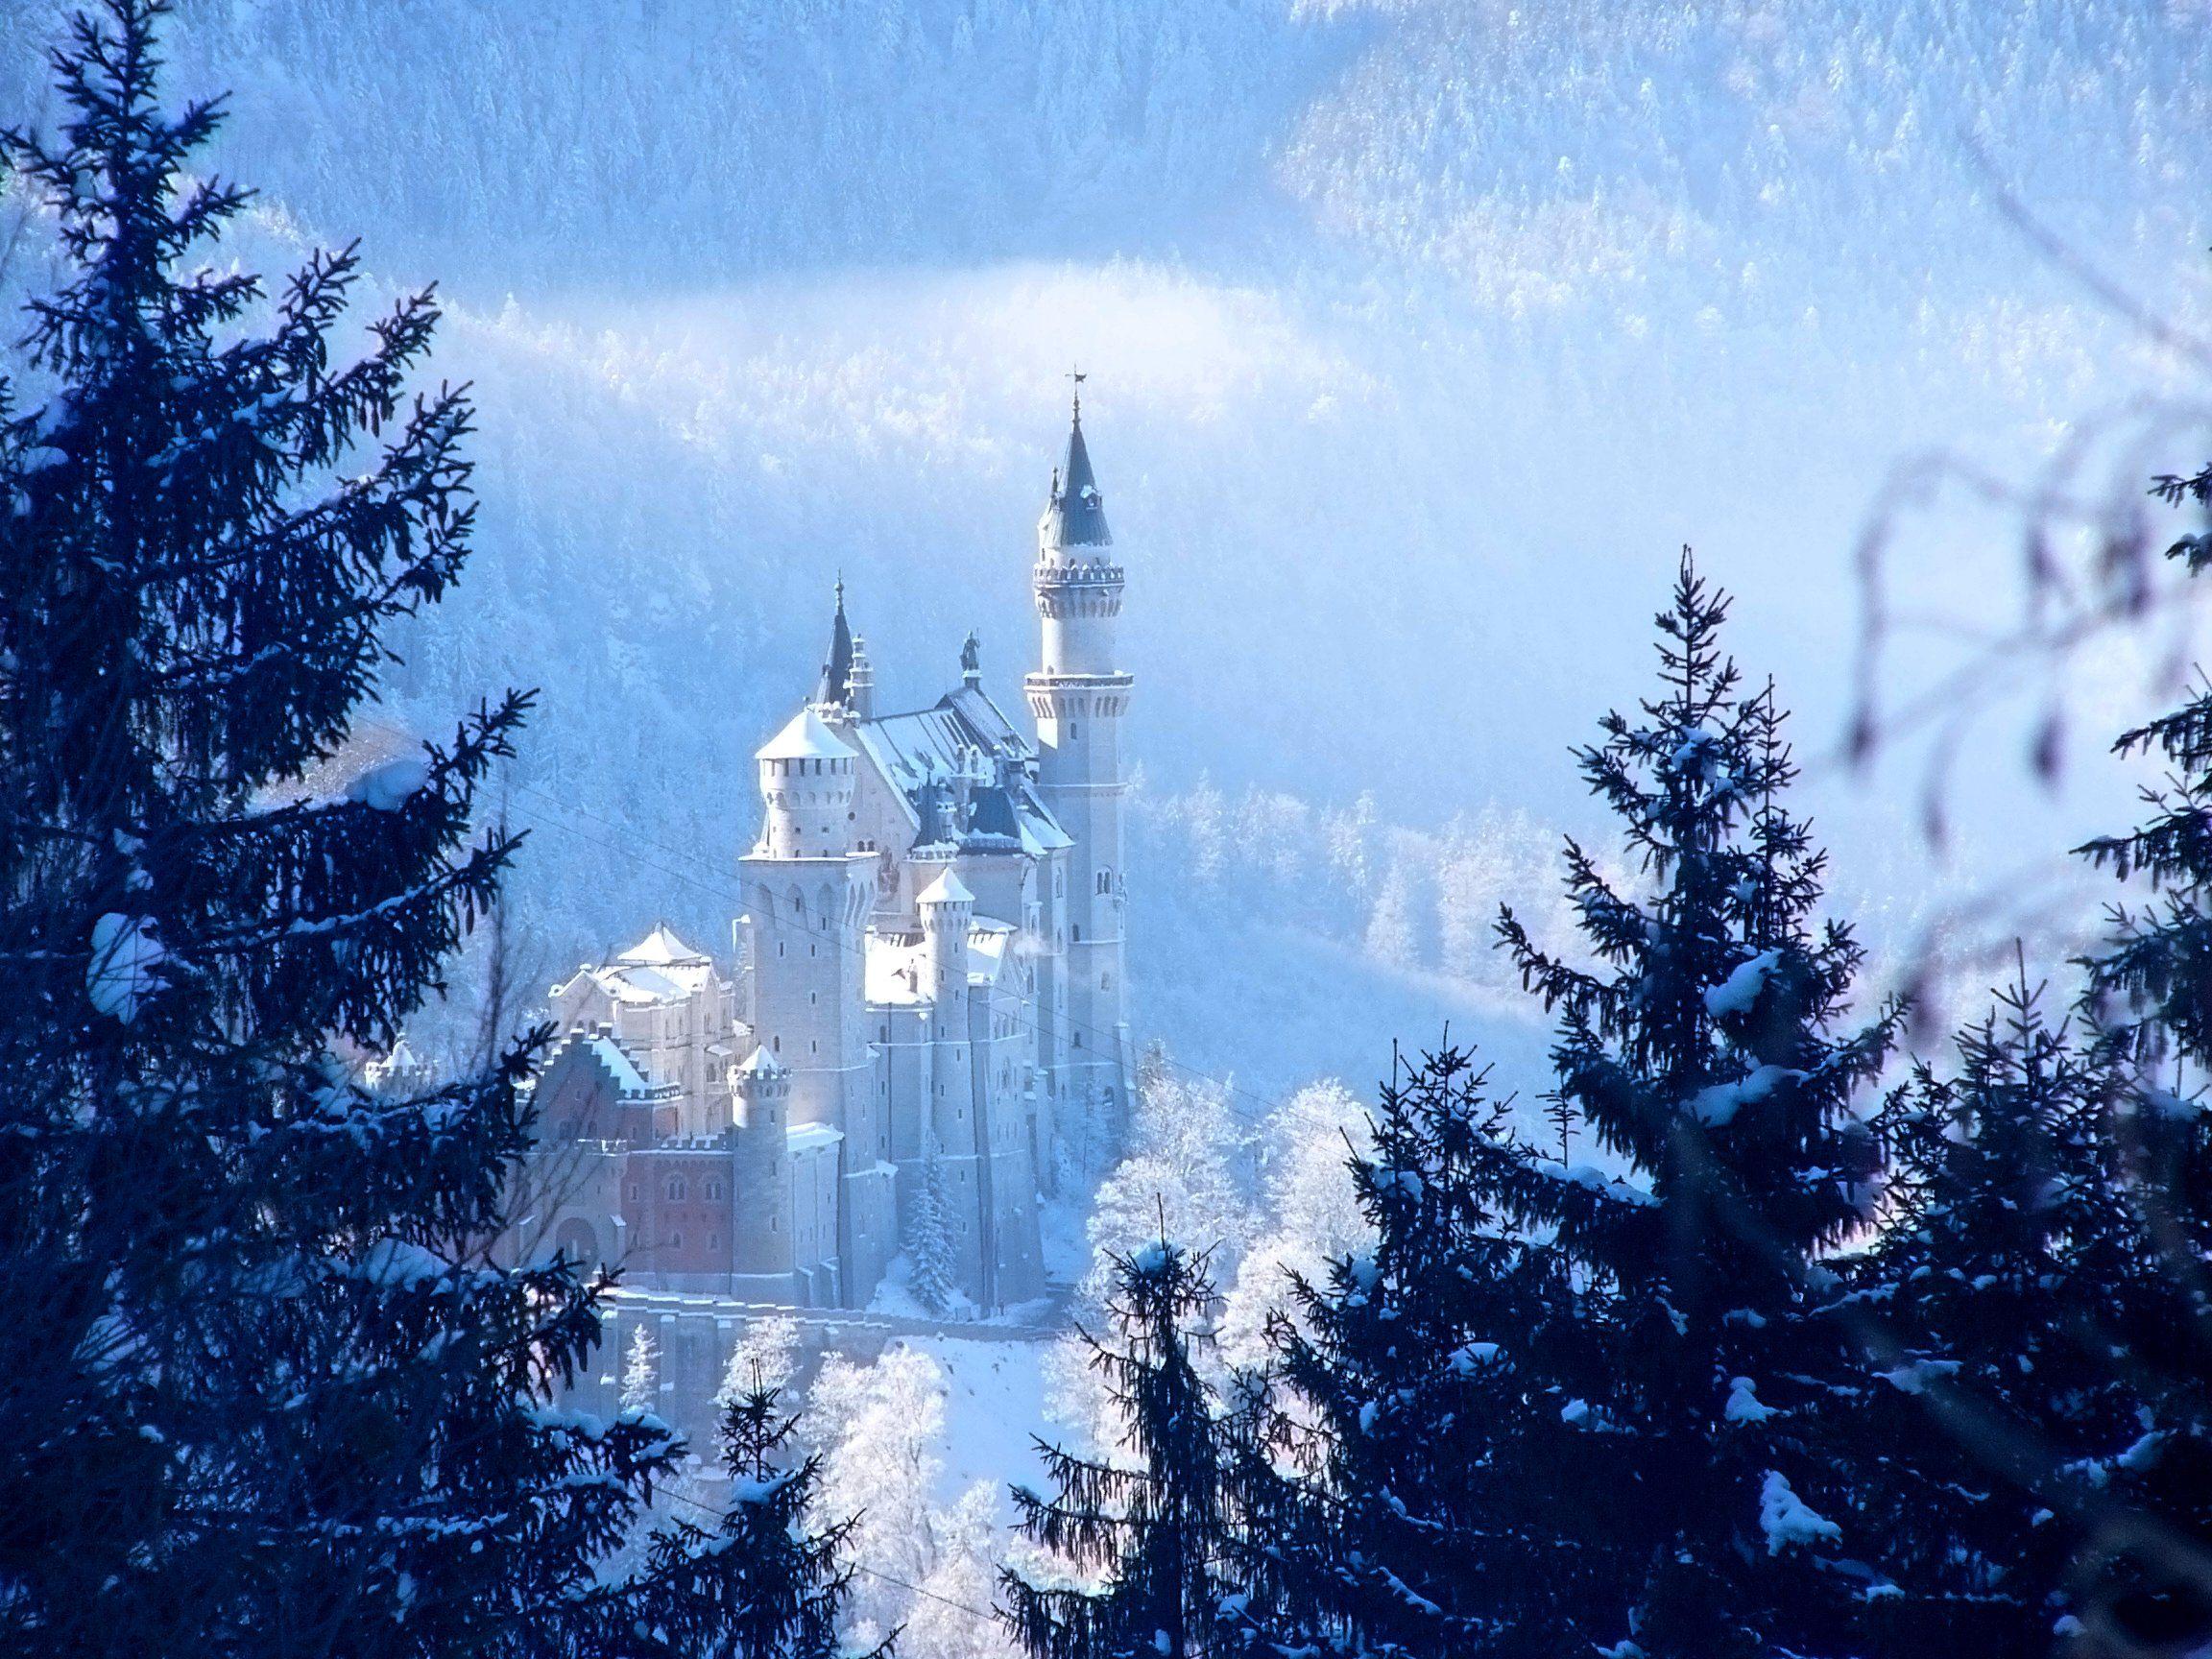 File Schloss Neuschwanstein Im Winter Jpg Wikimedia Commons Neuschwanstein Castle Romantic Road Castle Bavaria